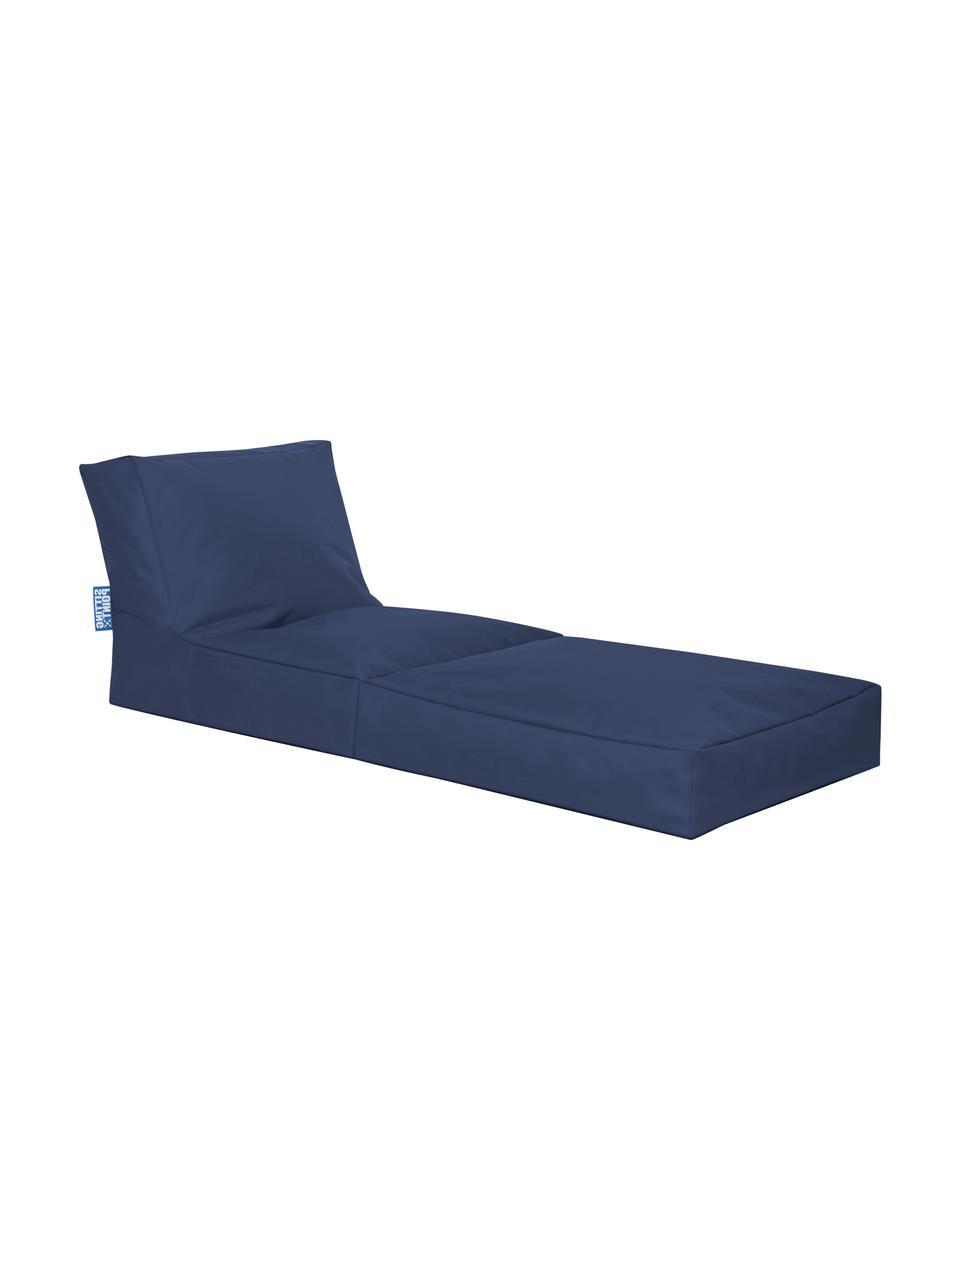 Poltrona letto da giardino Pop Up, Rivestimento: 100% poliestere All'inter, Blue jeans, Larg. 70 x Alt. 90 cm